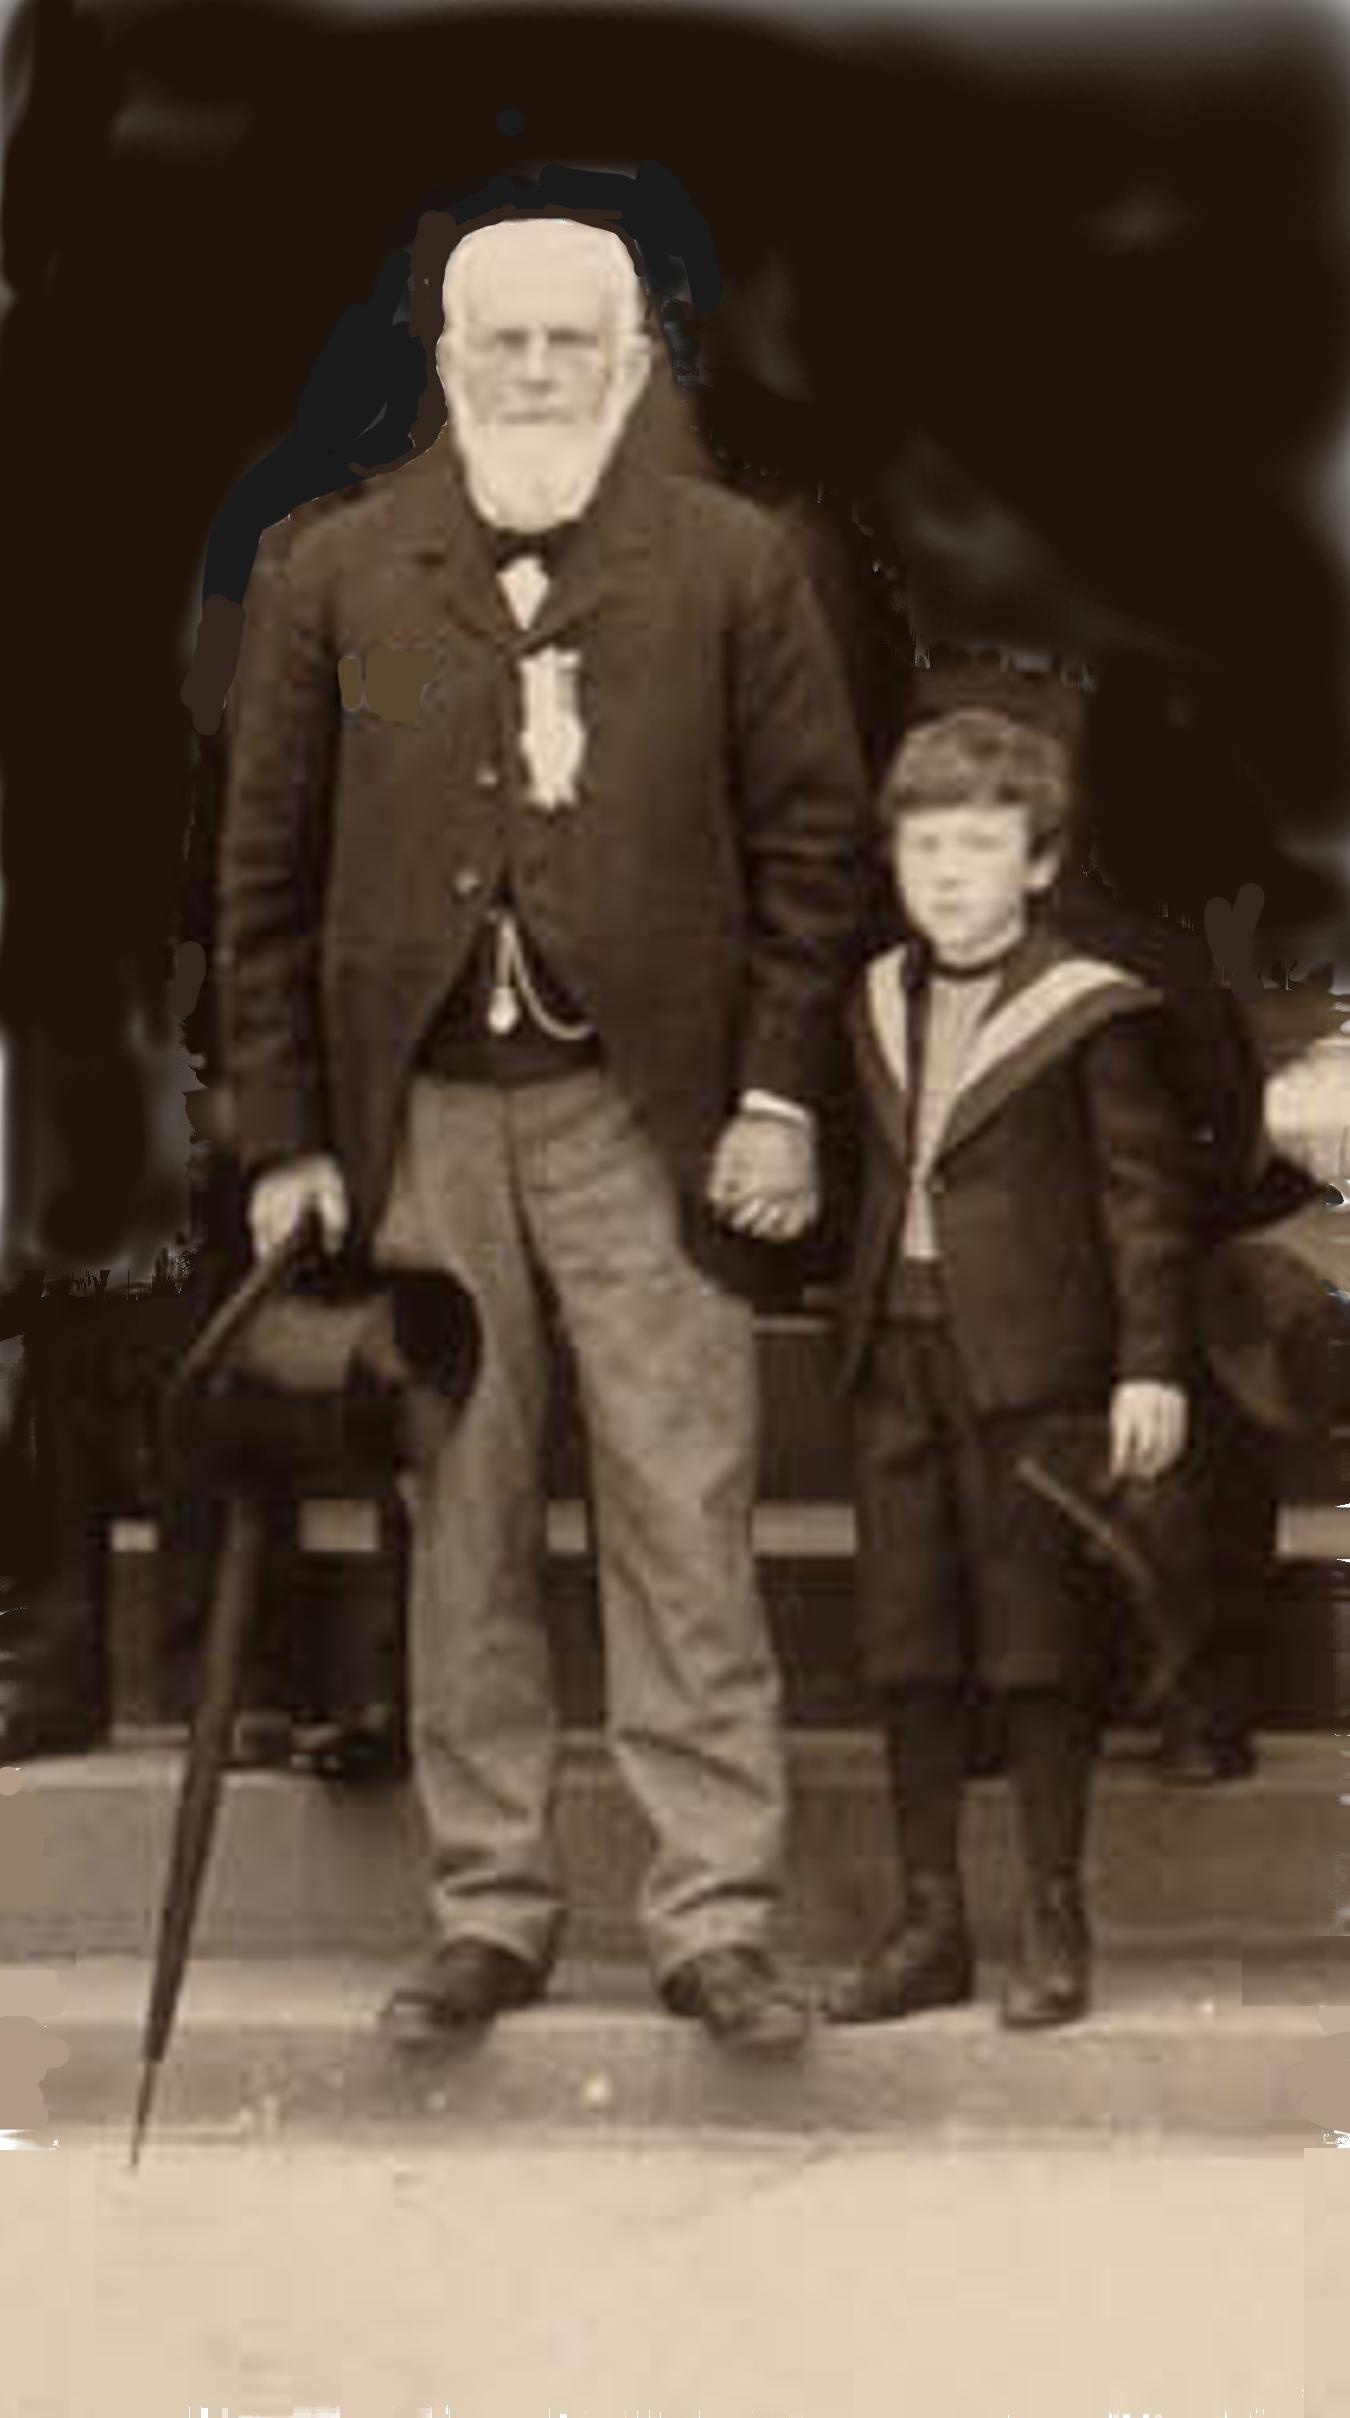 Alderman John E Russell, 1899